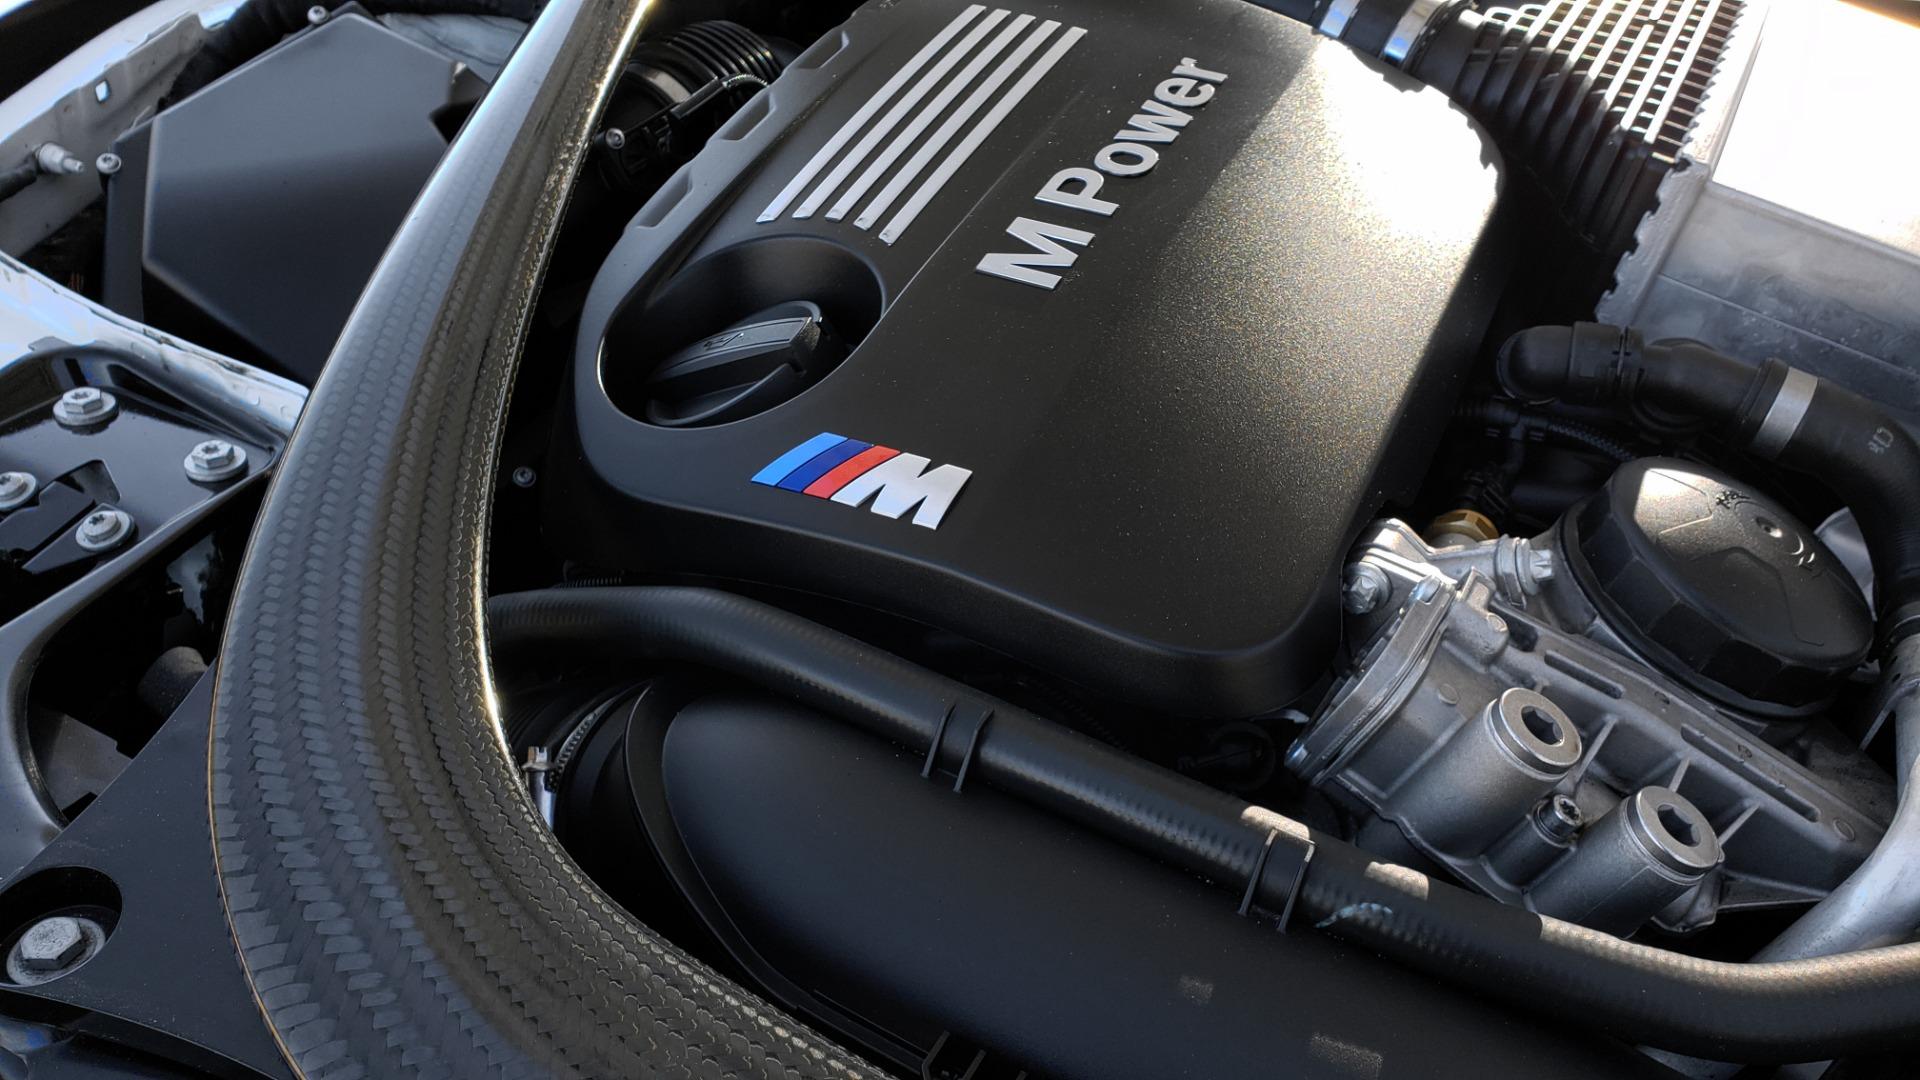 Used 2018 BMW M4 COMP PKG / EXEC / M-DRIVER / PARK CNTRL / ACTIVE BLIND SPOT for sale Sold at Formula Imports in Charlotte NC 28227 21